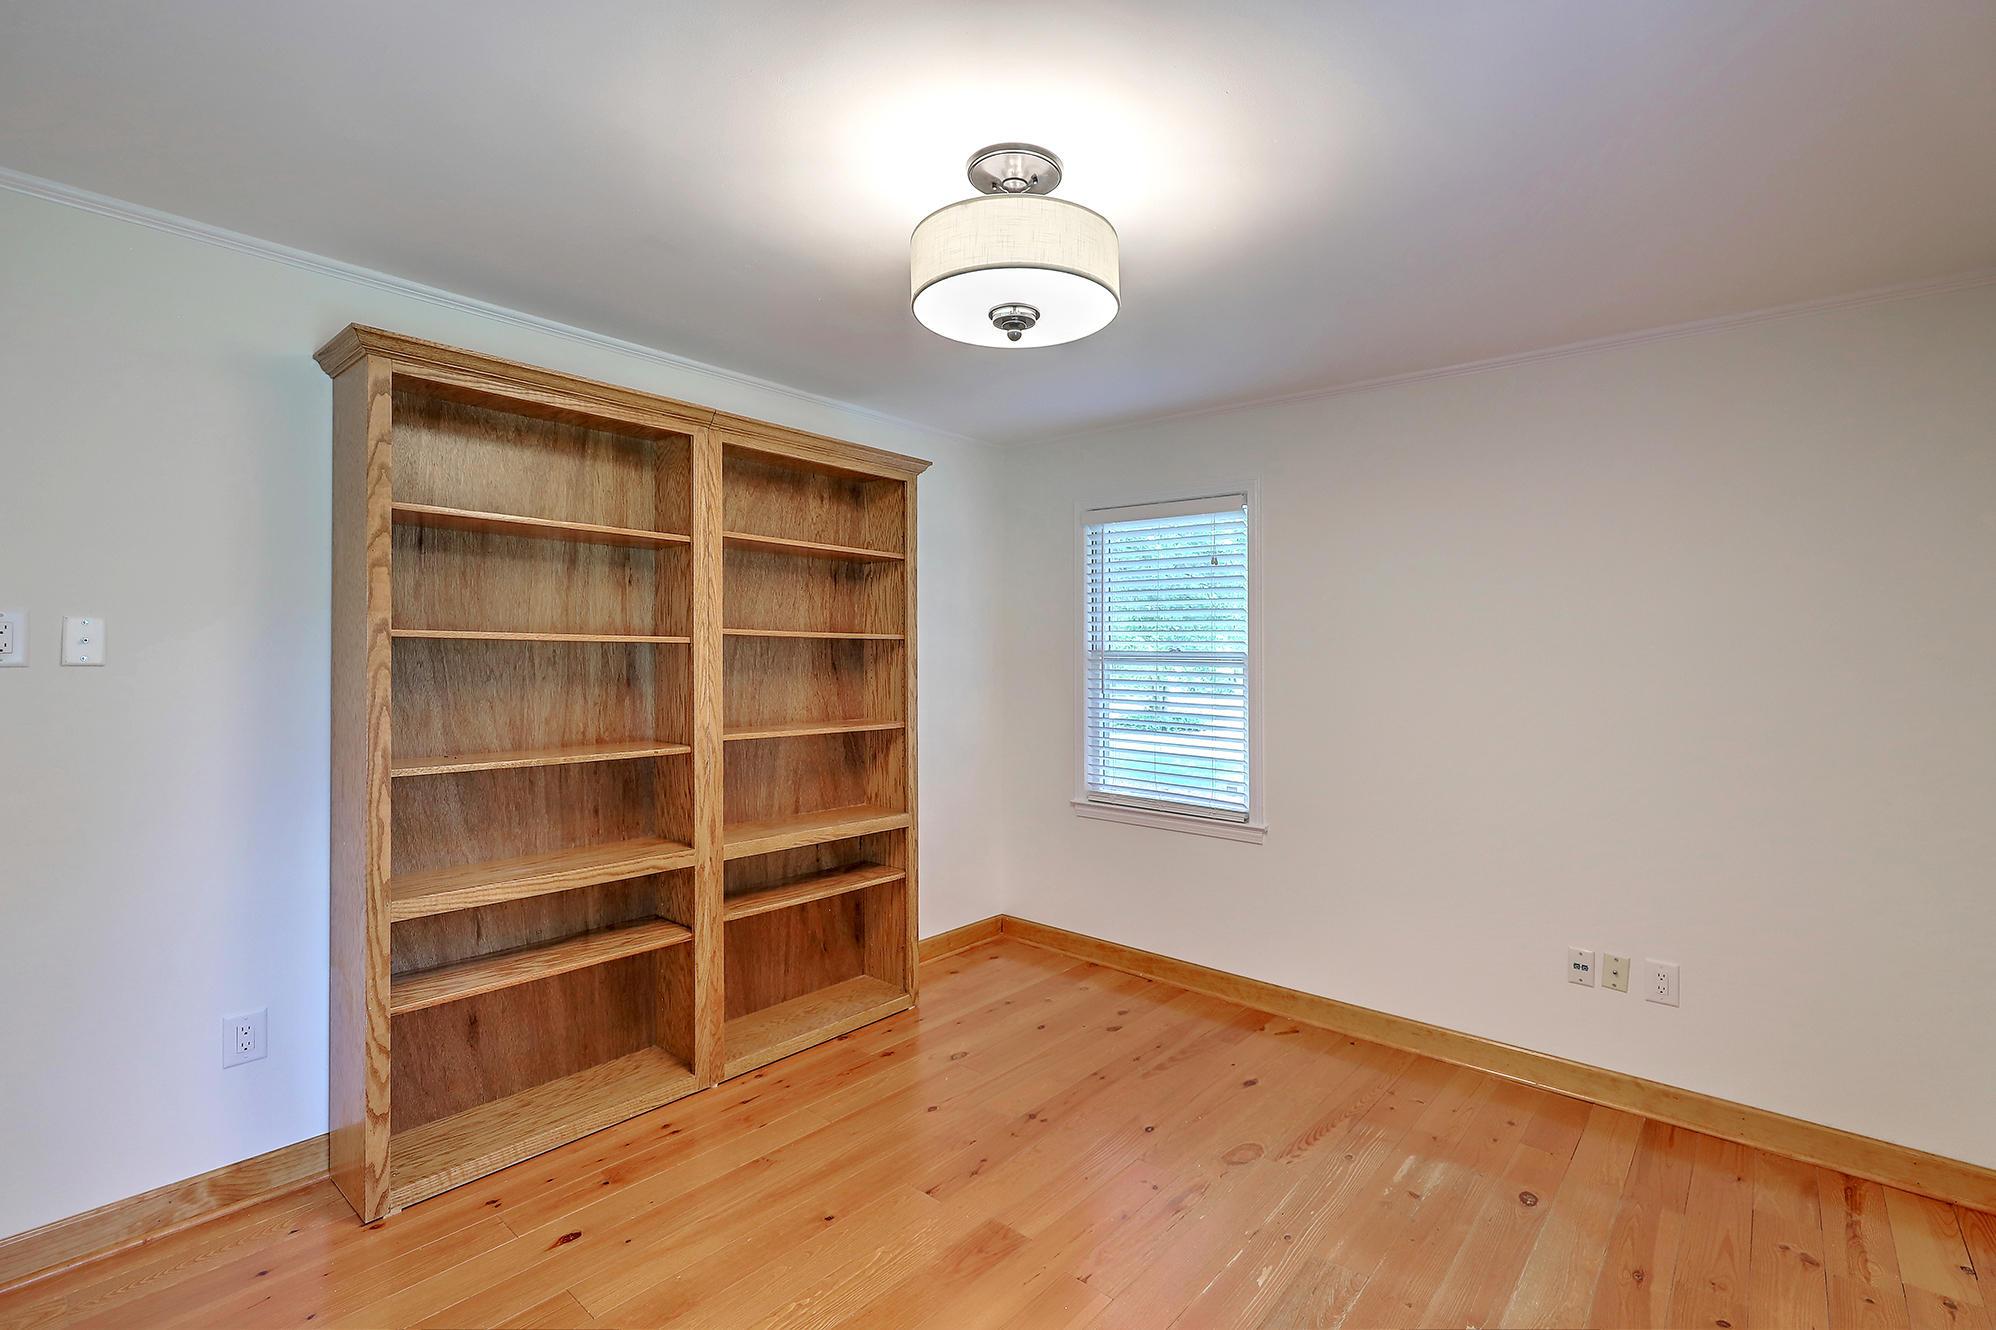 Edgewater Park Homes For Sale - 1413 Edsent, Charleston, SC - 27